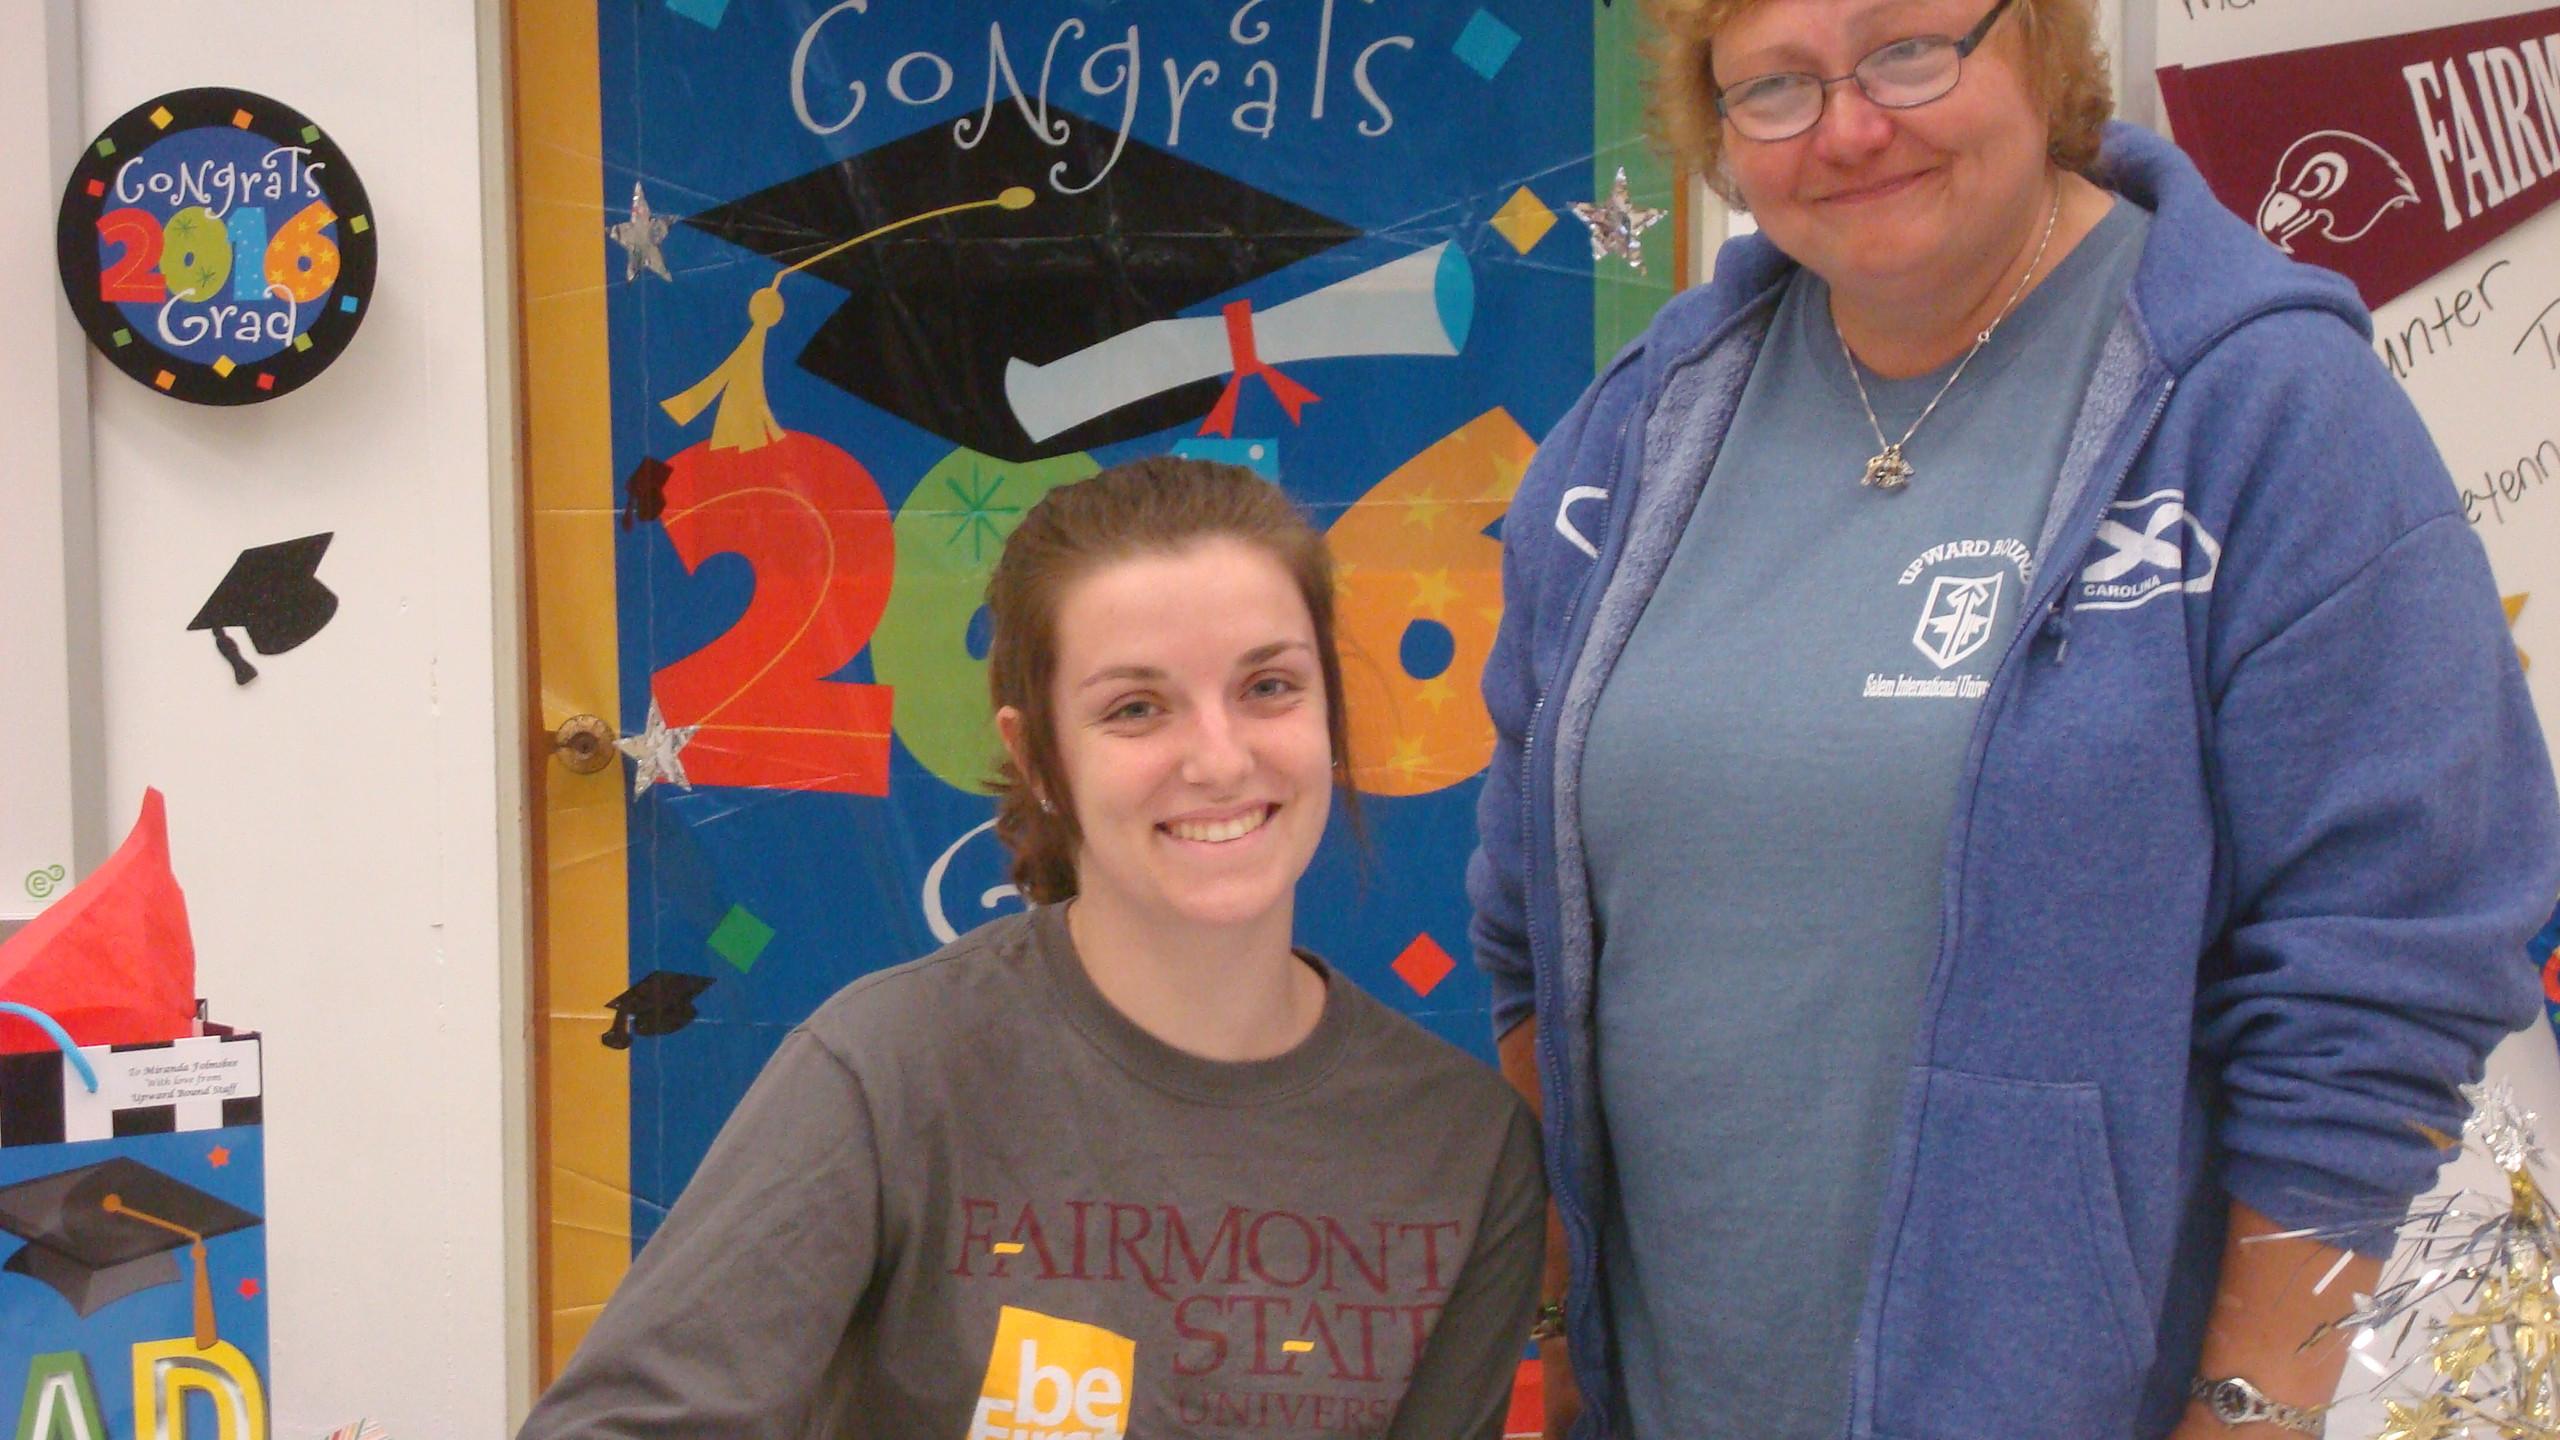 Miranda will be attending Fairmont State University